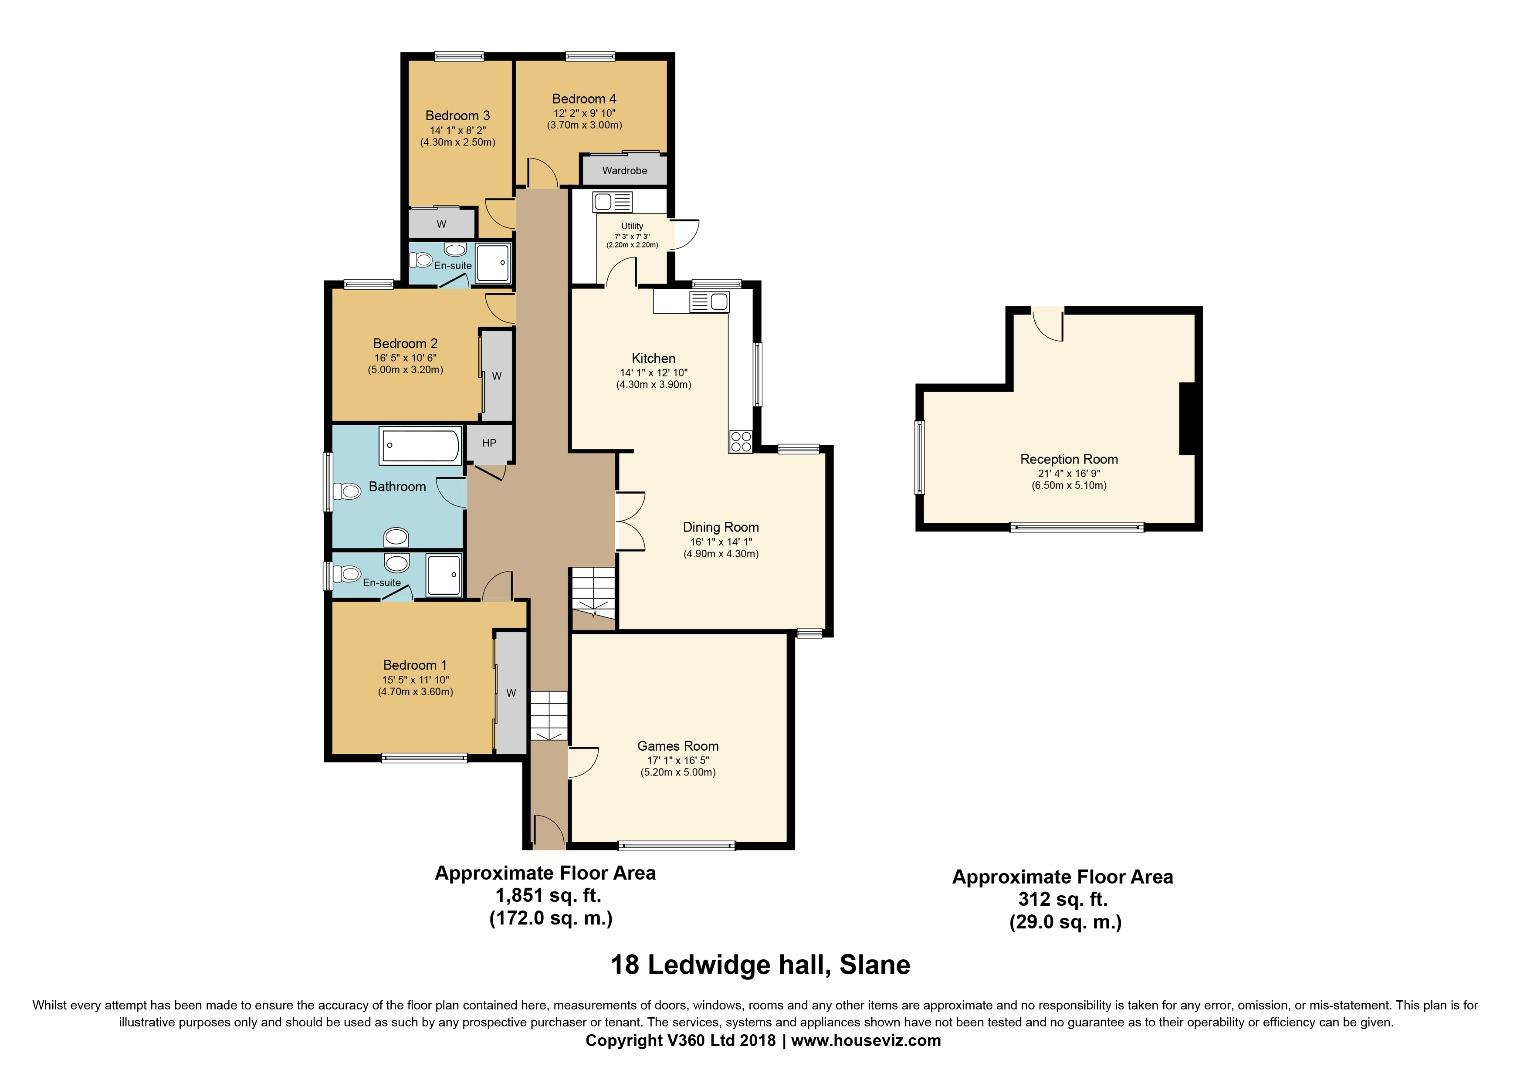 4 bed House for sale on 18 Ledwidge Hall, Slane, Co. Meath - Property Floorplan